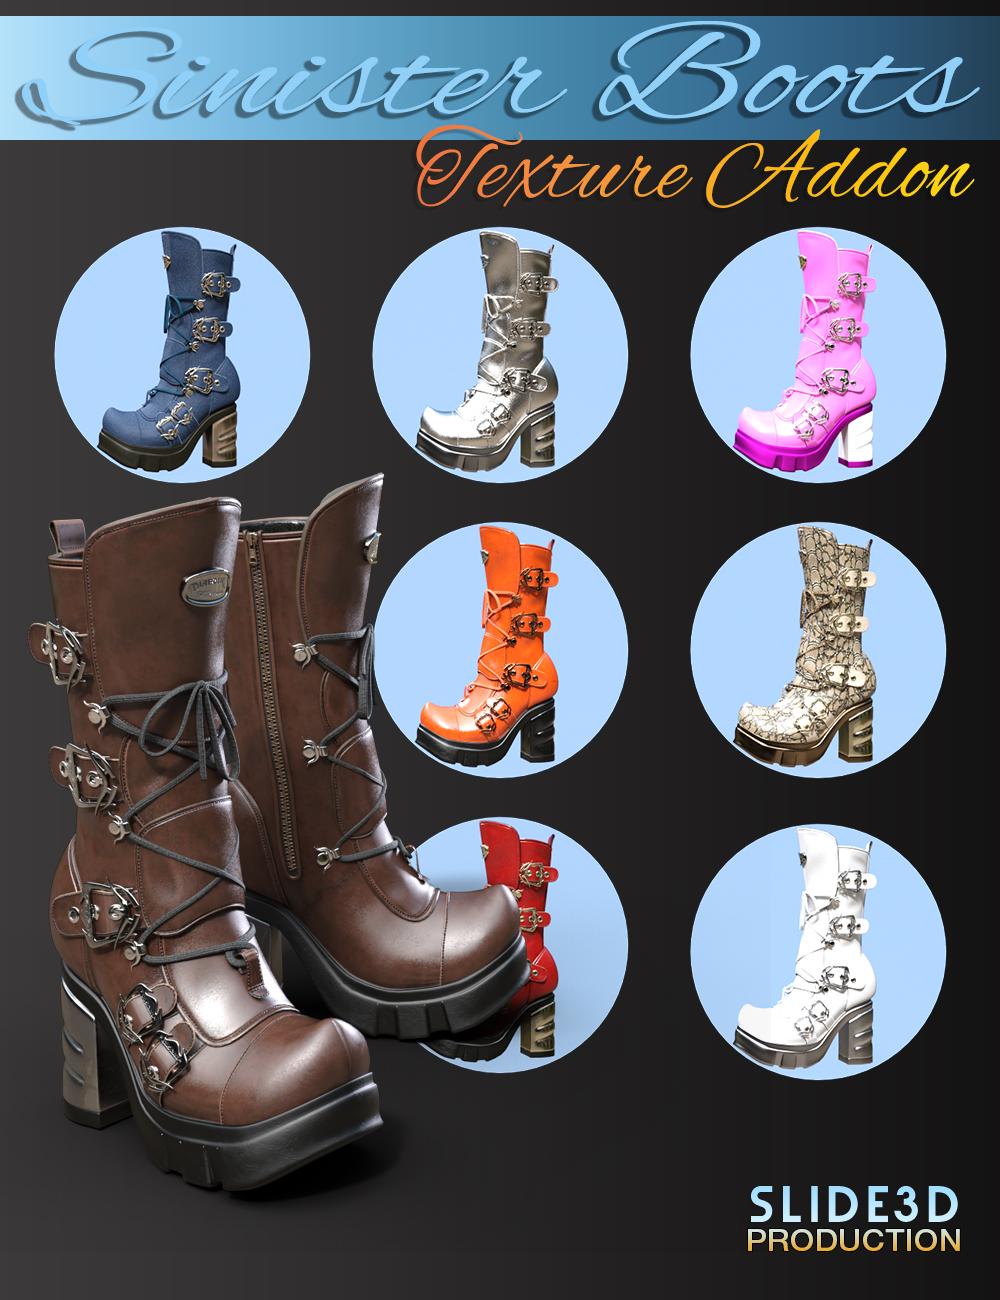 Slide3D Sinister Boots for Genesis 3 Female(s) Texture Addons by: Slide3D, 3D Models by Daz 3D